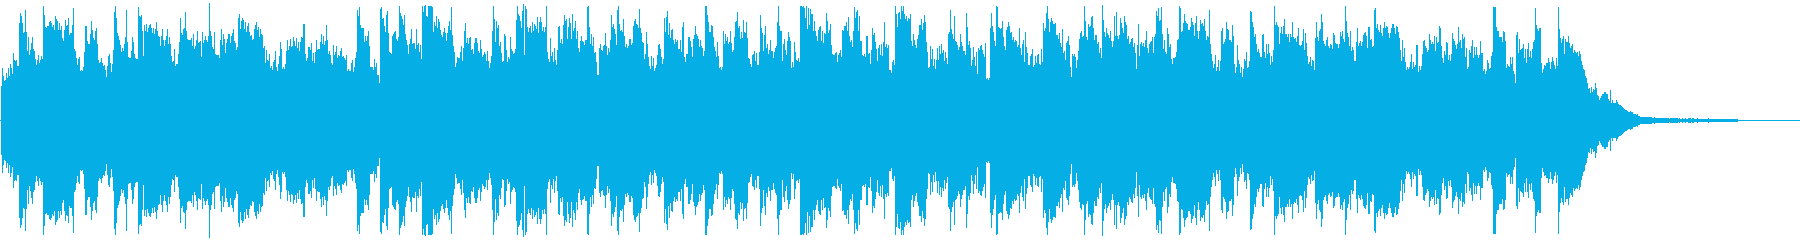 CM・おしゃれな洋楽ディスコの再生済みの波形